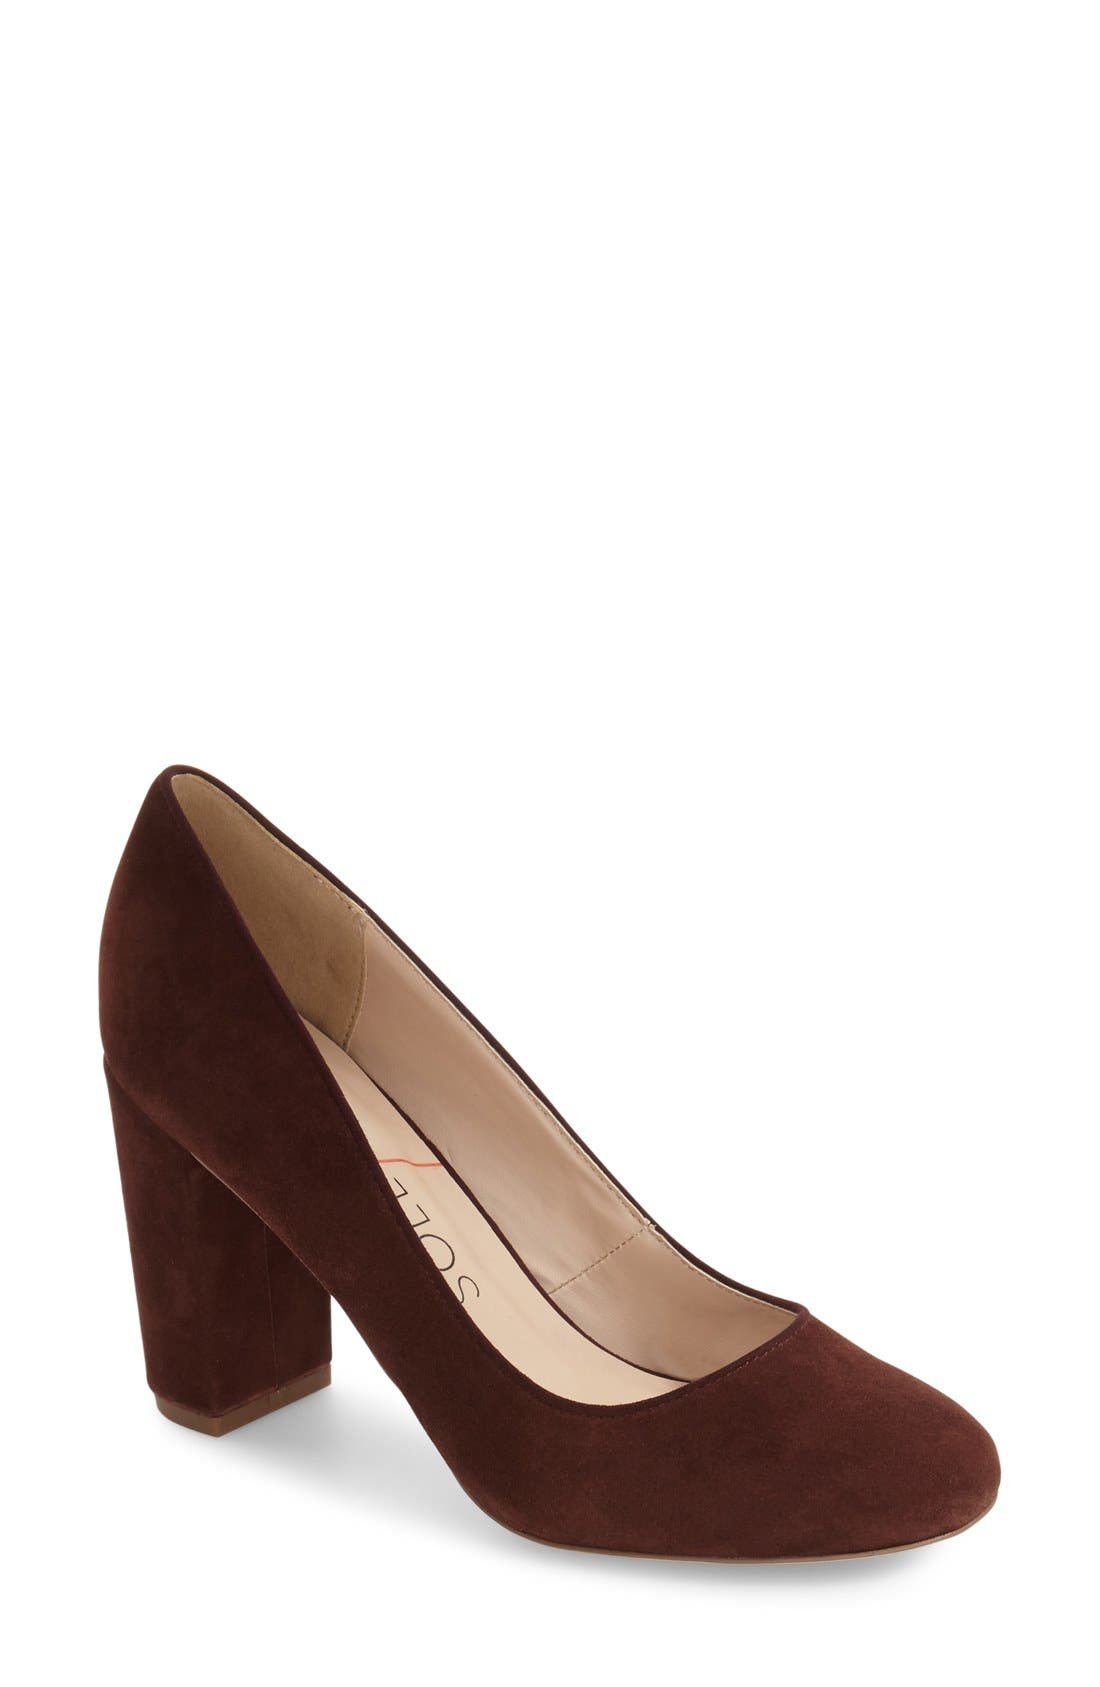 Alternate Image 1 Selected - Sole Society Giselle Block Heel Pump (Women)